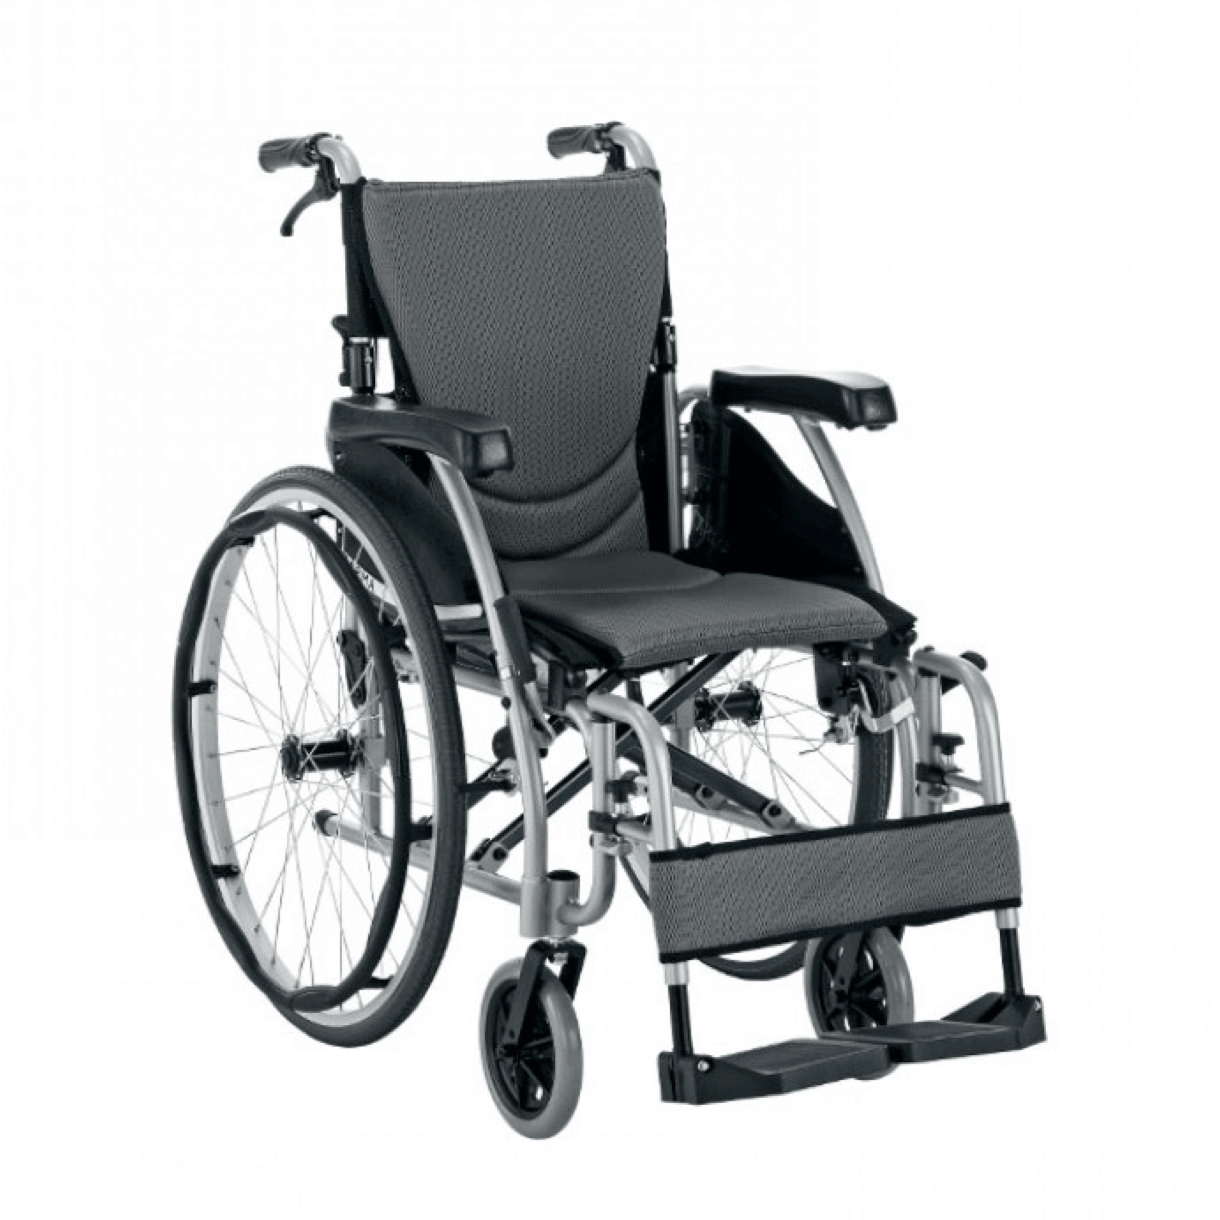 Karma Ergo 125 - manual wheelchair